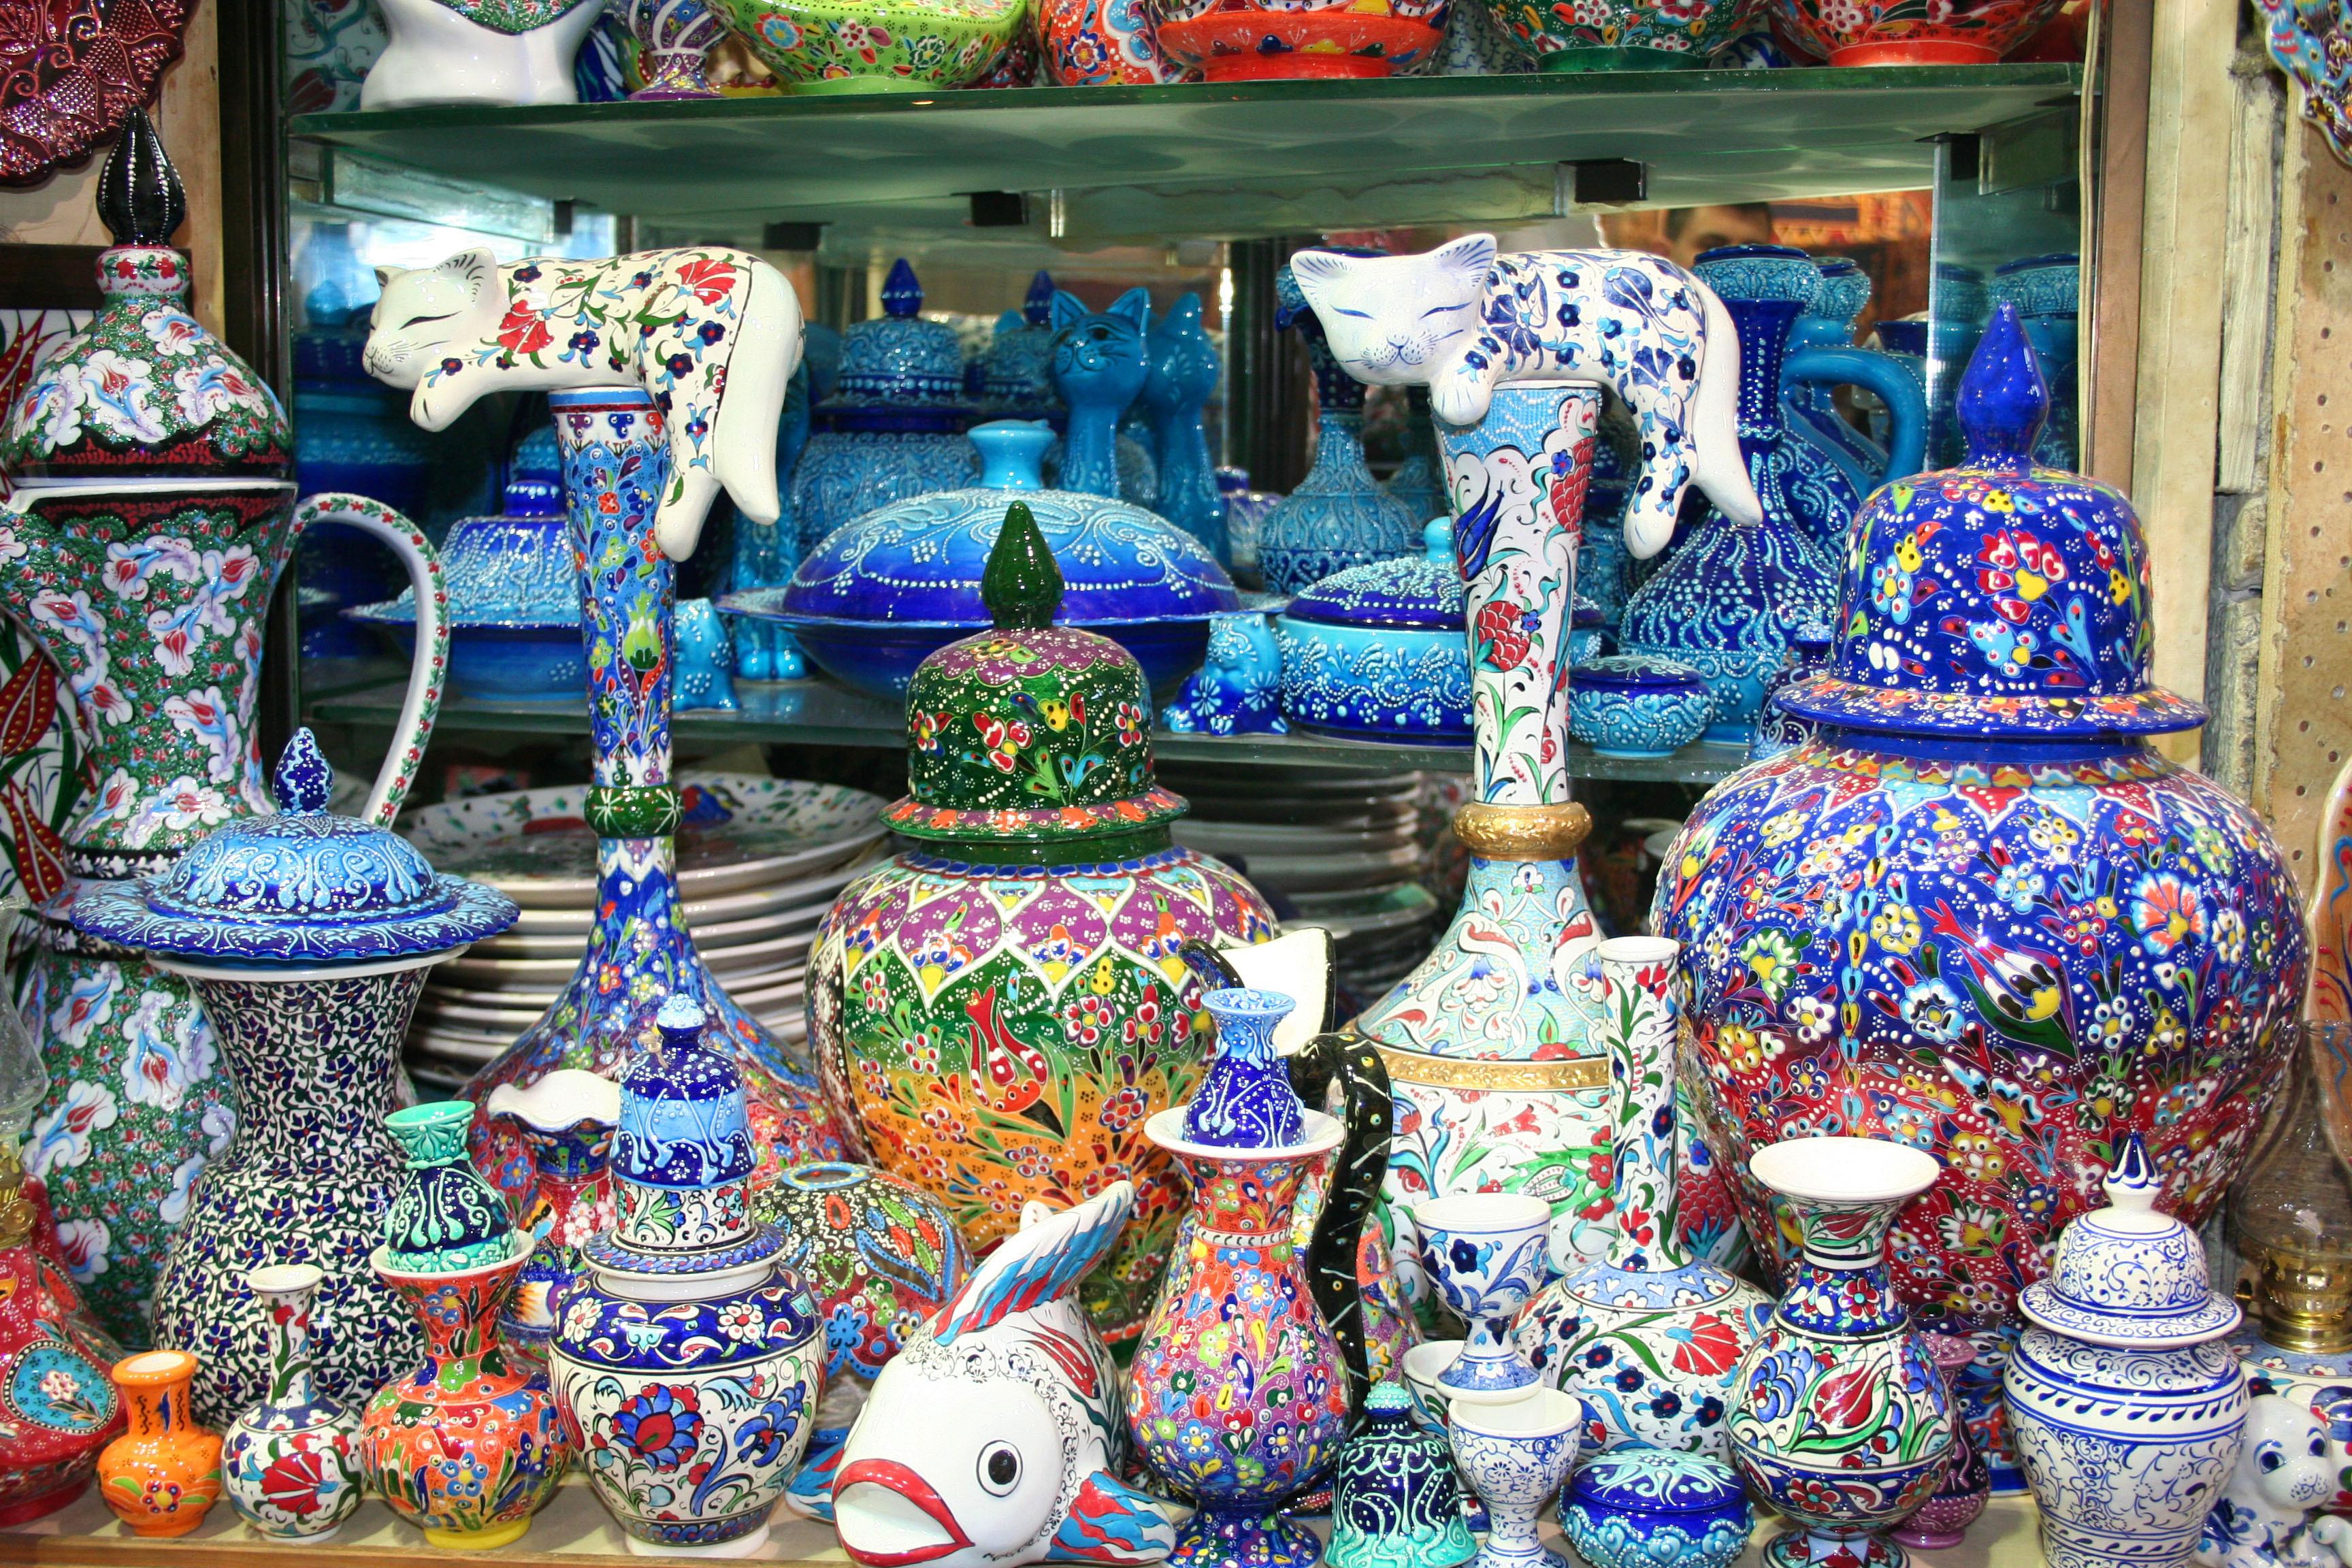 souvenirs at grand bazaar, istanbul; eladora/shutterstock